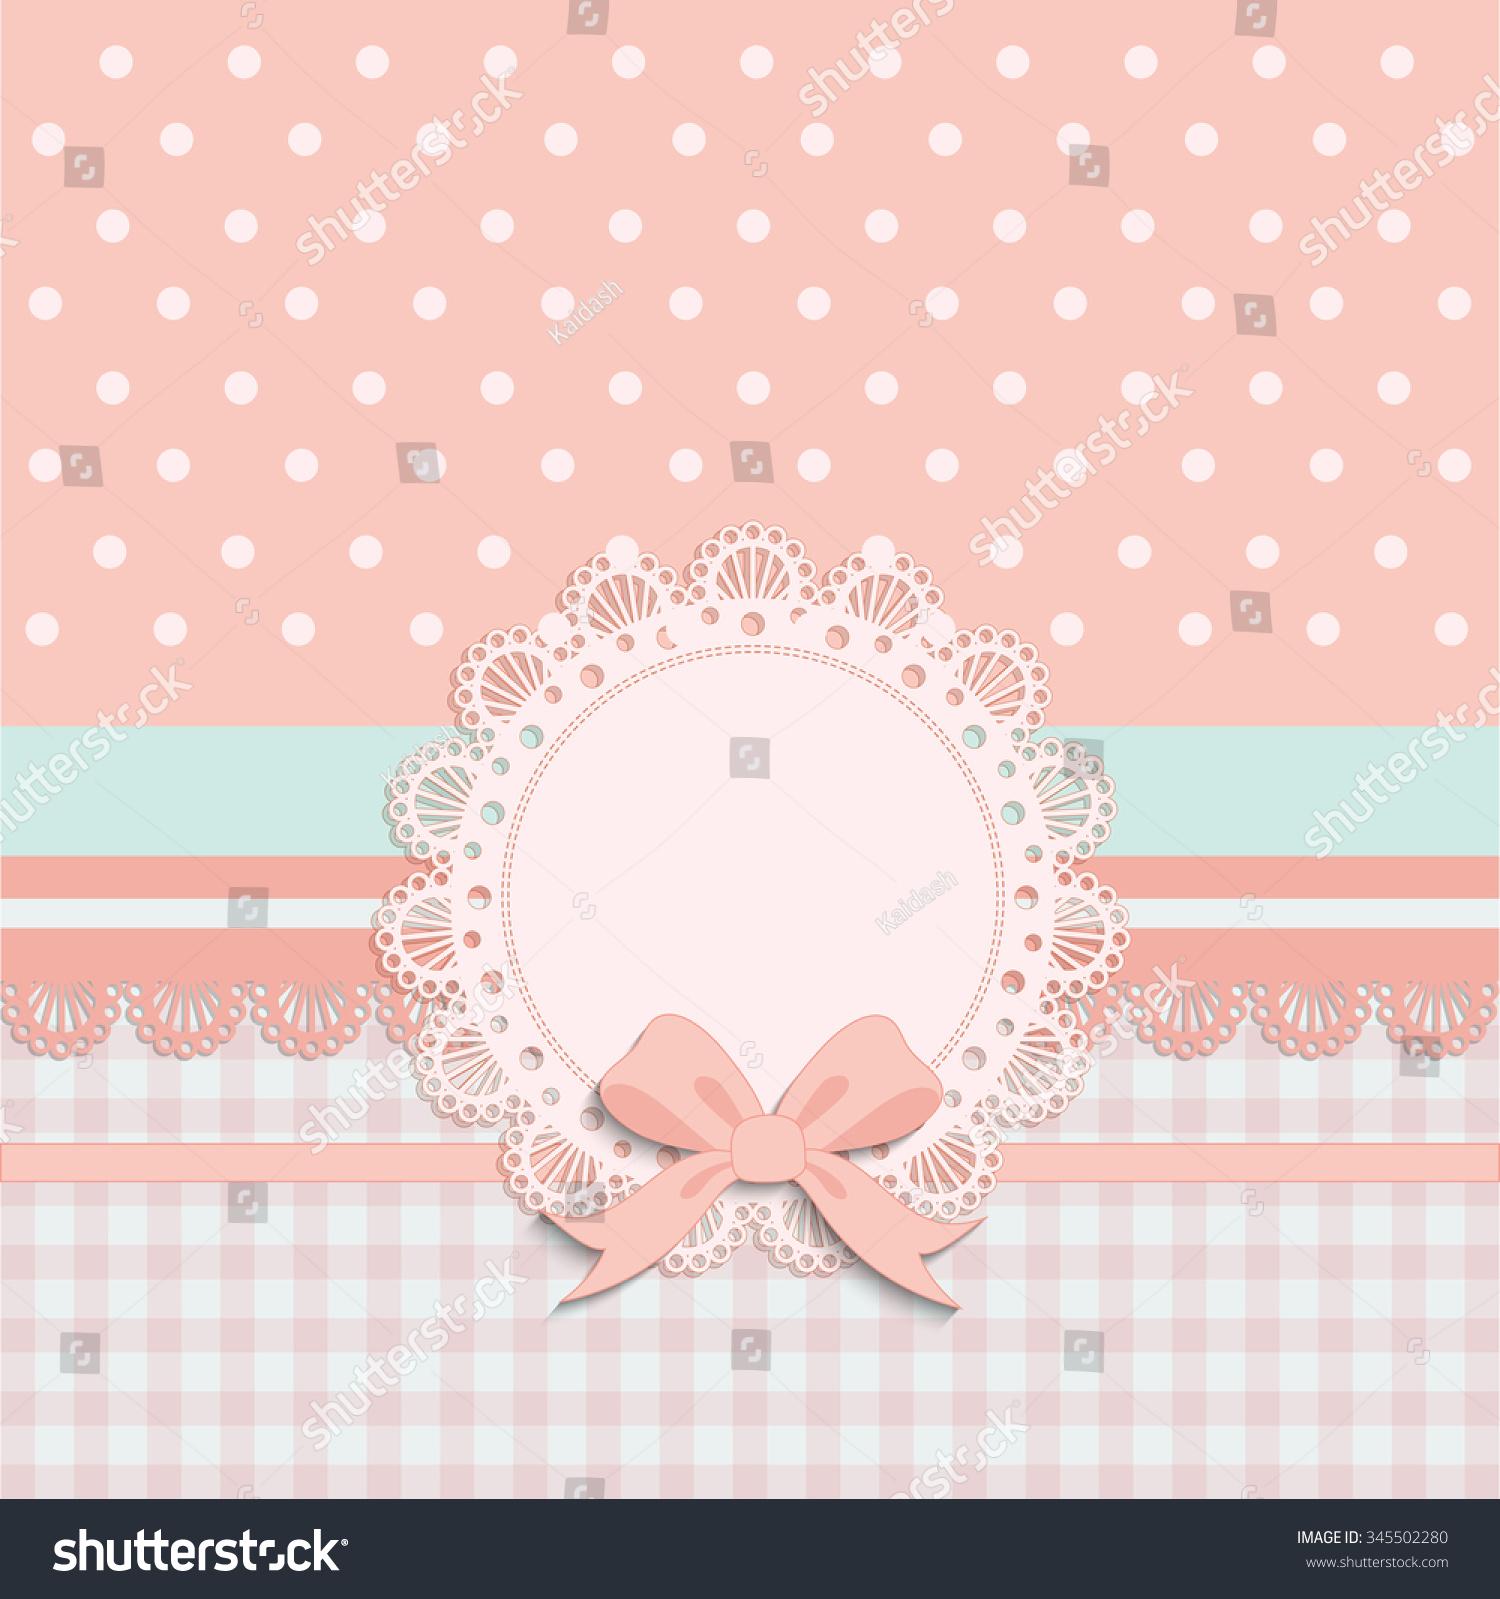 cream polka dot wallpaper